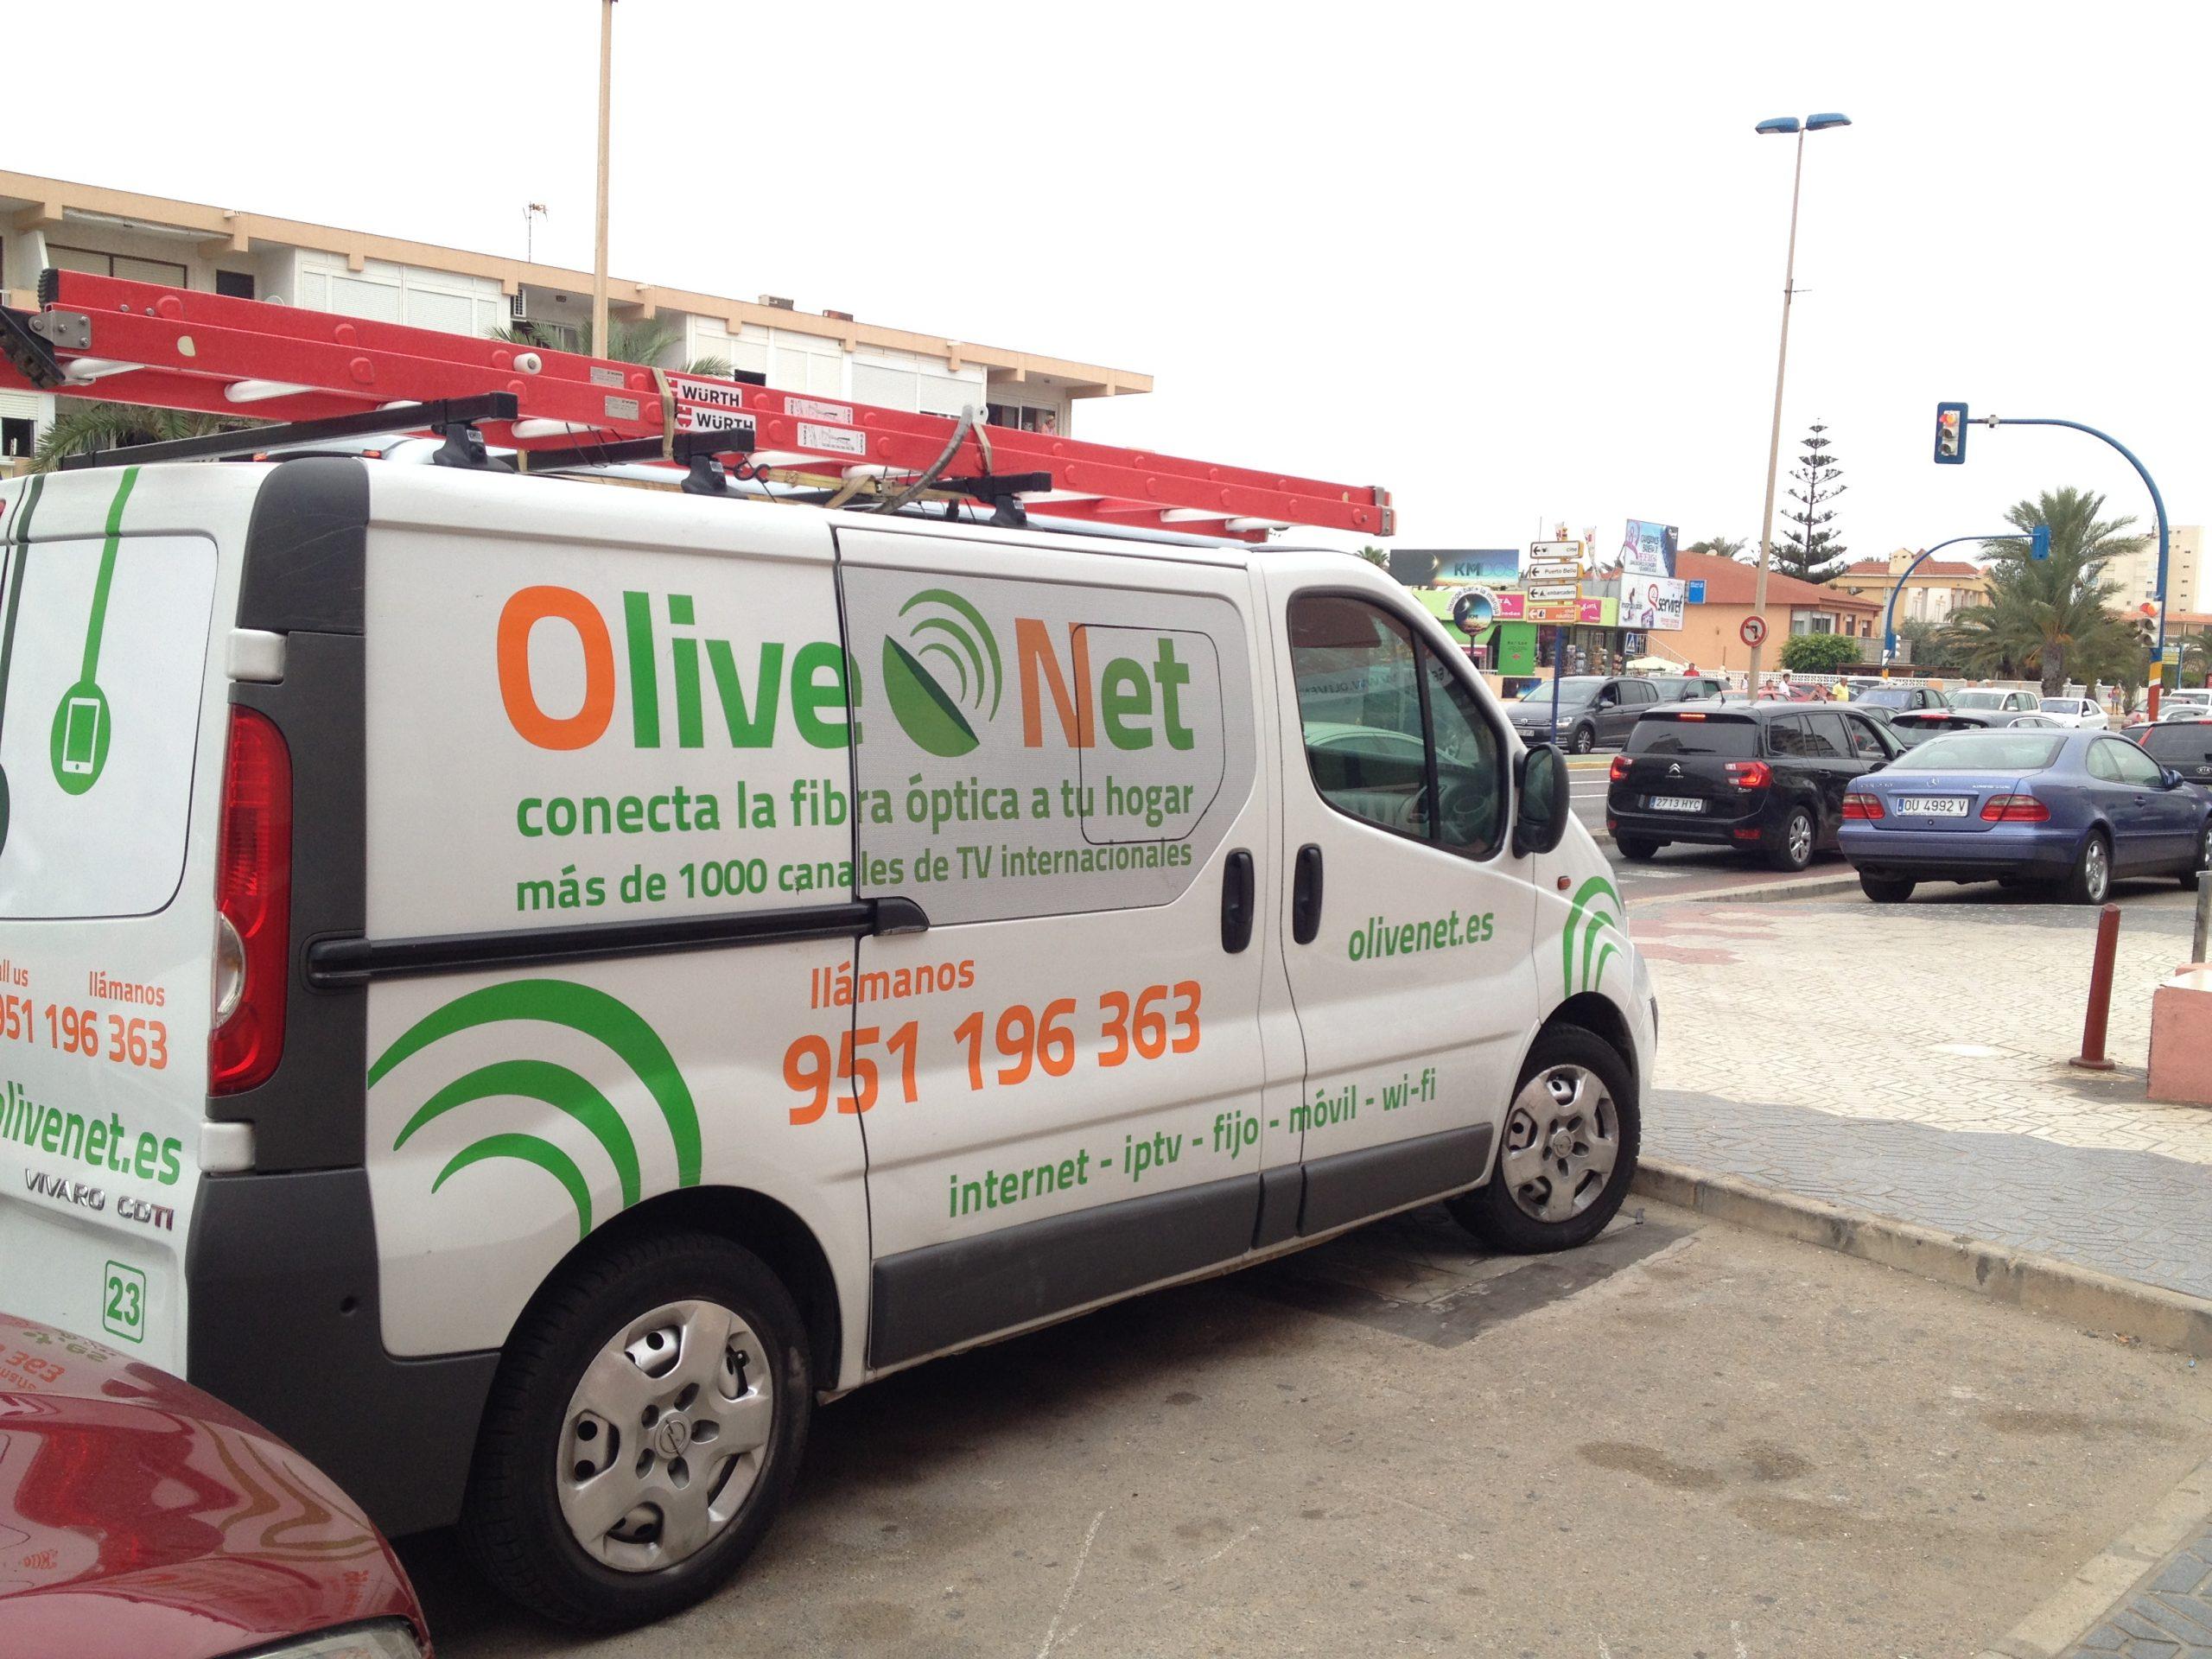 Olivenet